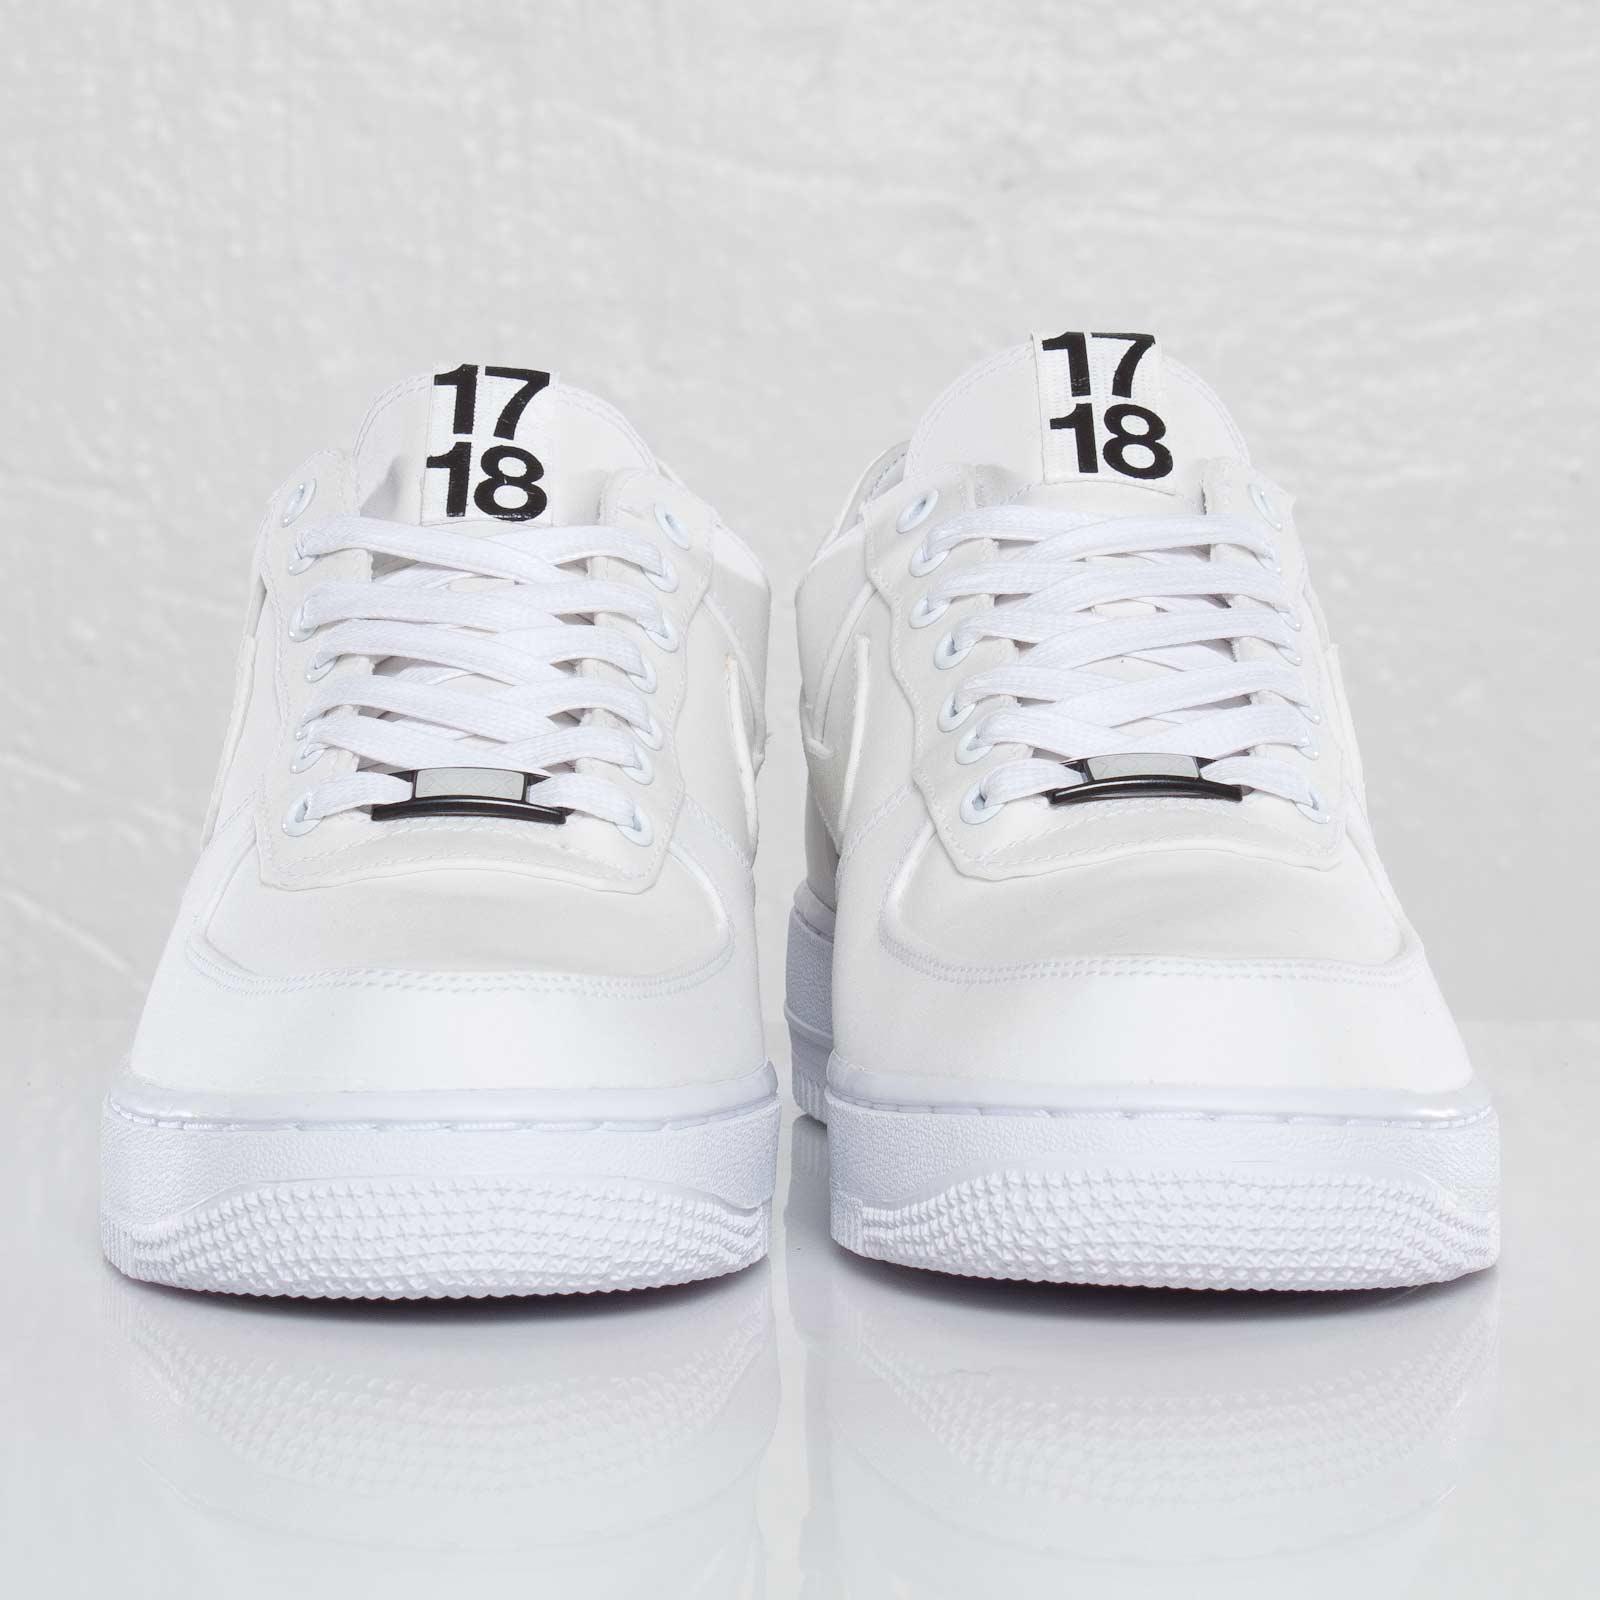 sports shoes 58e4d 38552 Nike Air Force 1 DSM NRG - 110736 - Sneakersnstuff   sneakers   streetwear  online since 1999